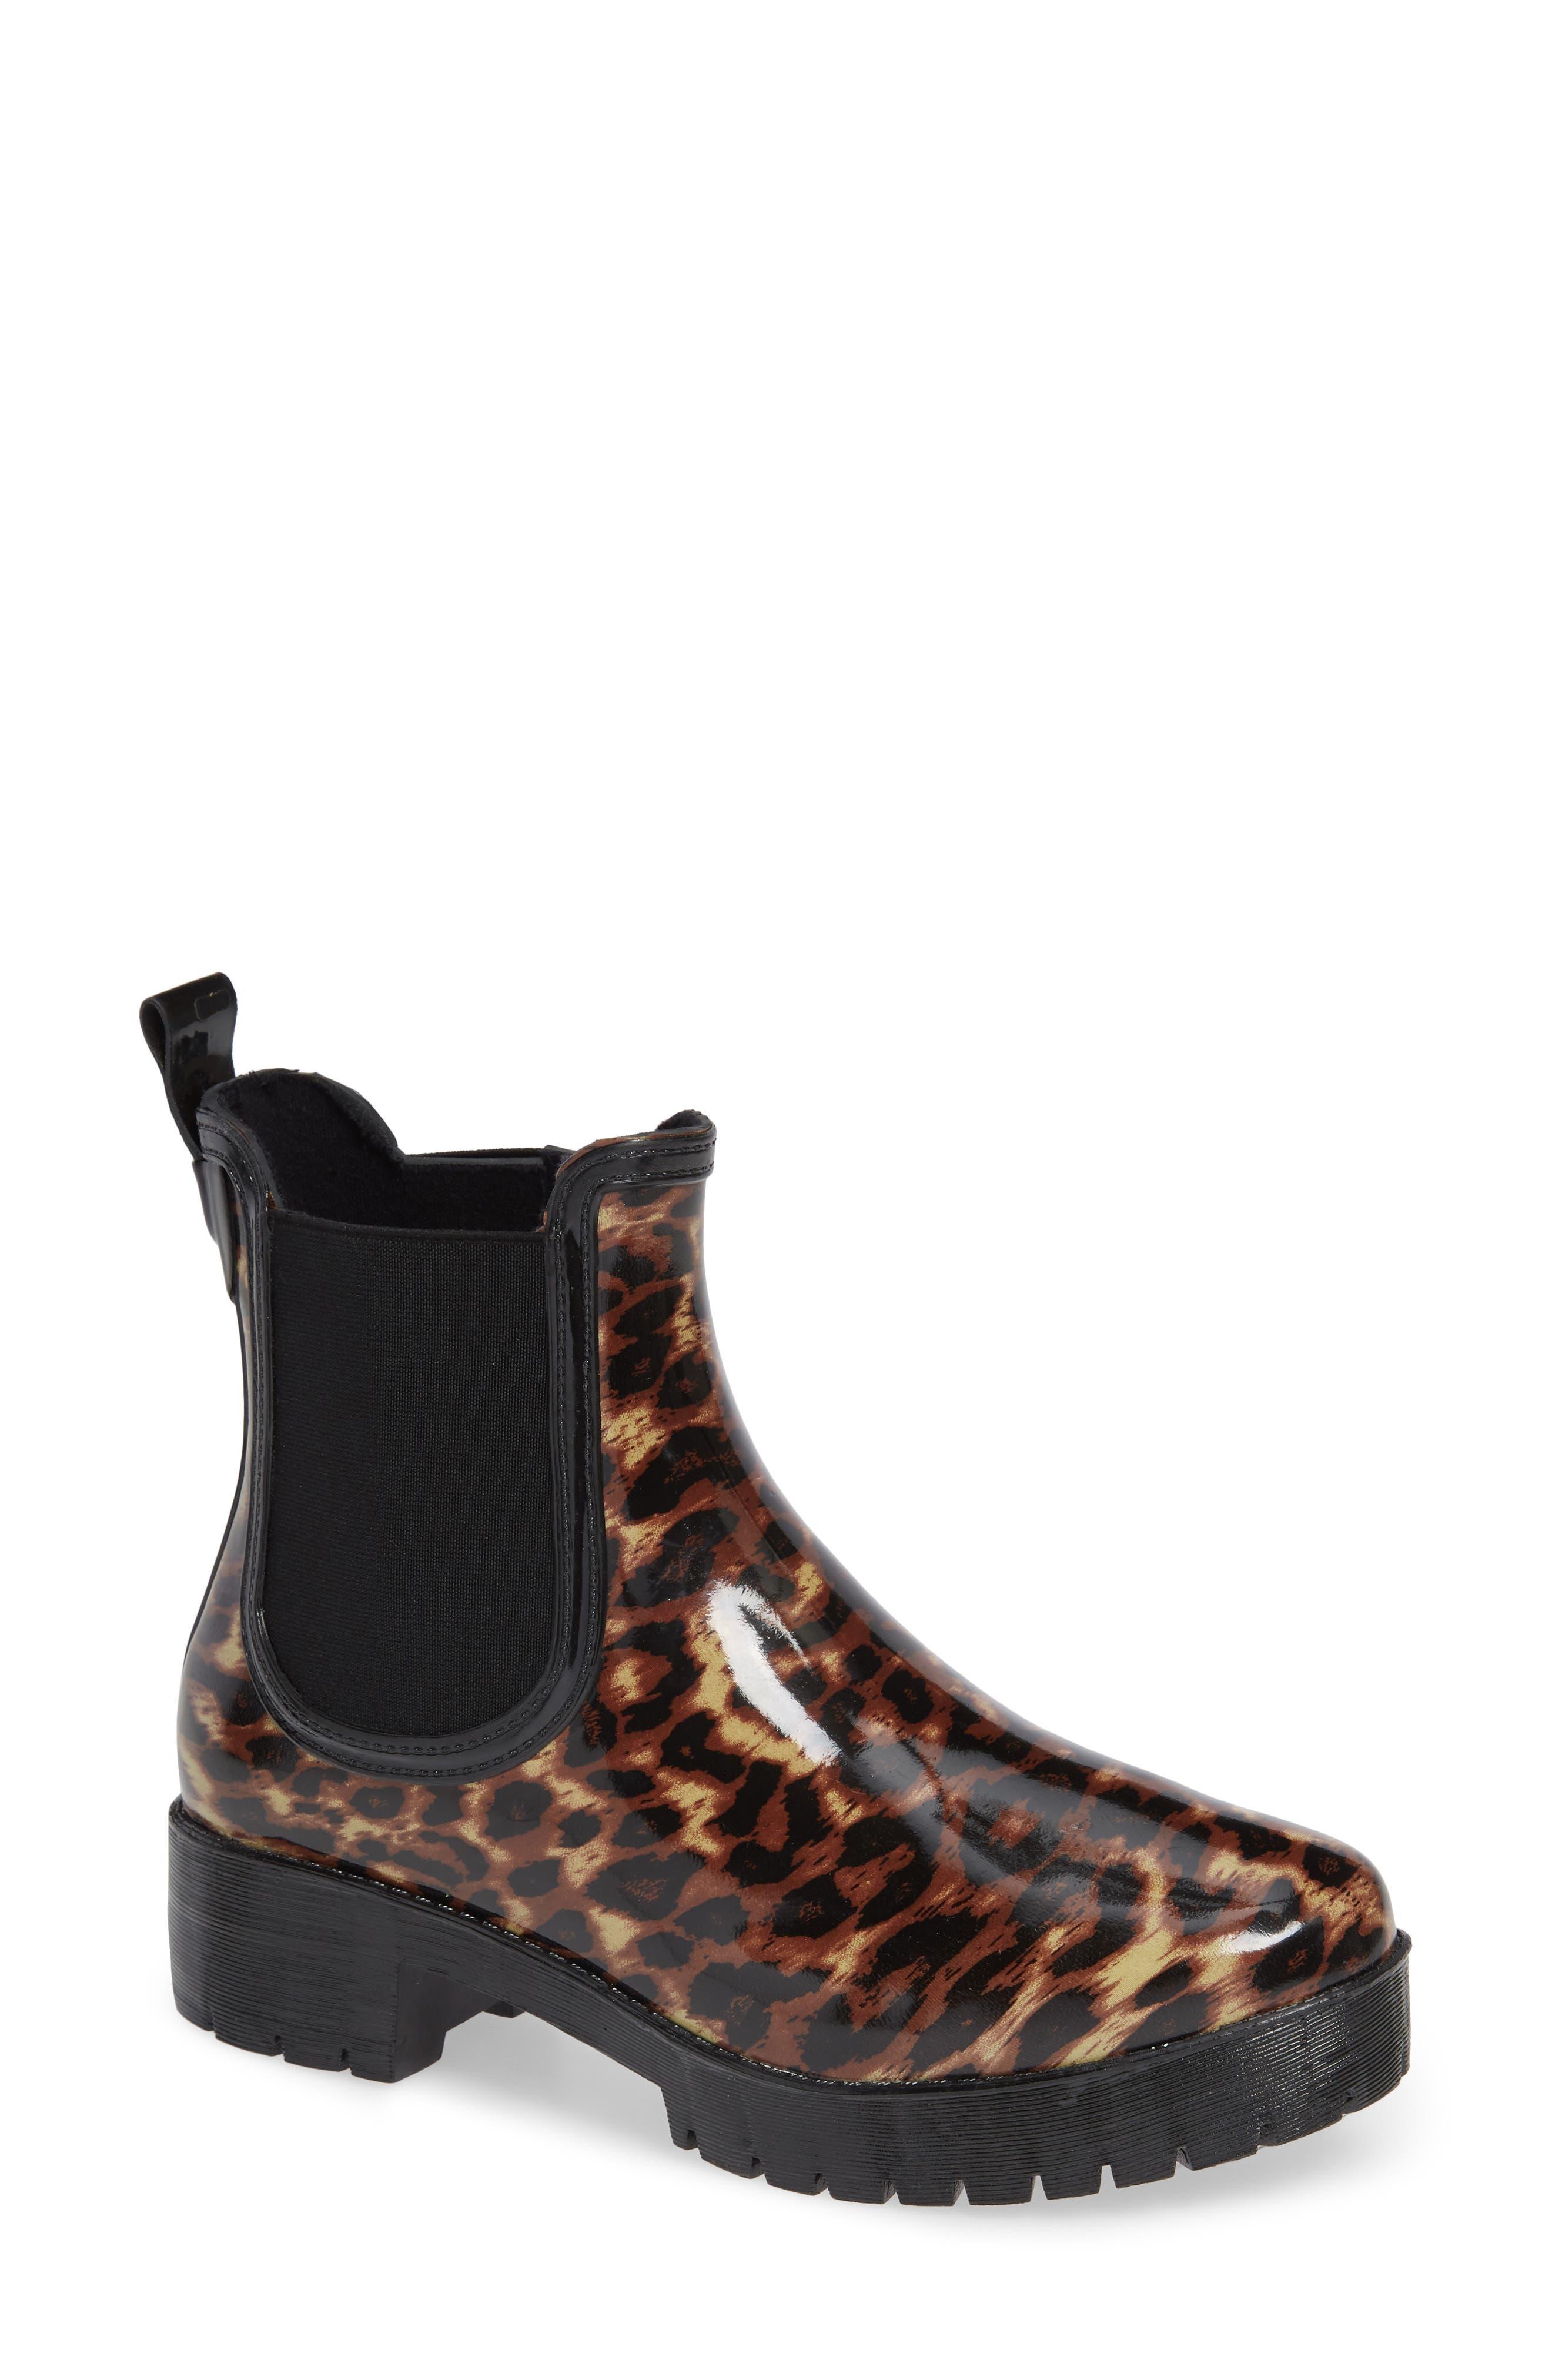 JEFFREY CAMPBELL Cloudy Chelsea Rain Boot, Main, color, 200